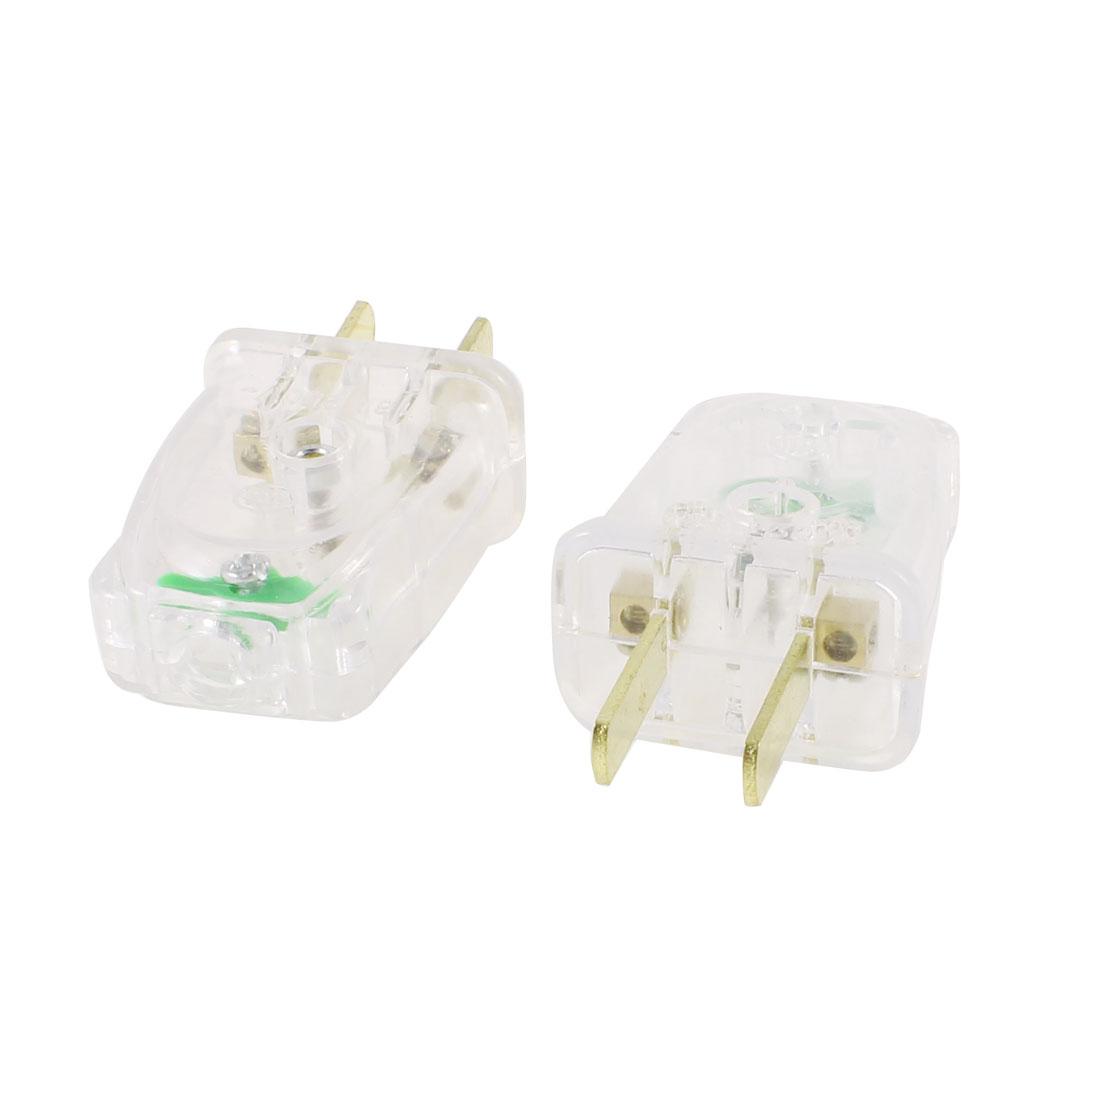 2 Pcs Clear Plastic Shall 2 Flat Pin US Plug Power Adapter AC 250V 16A